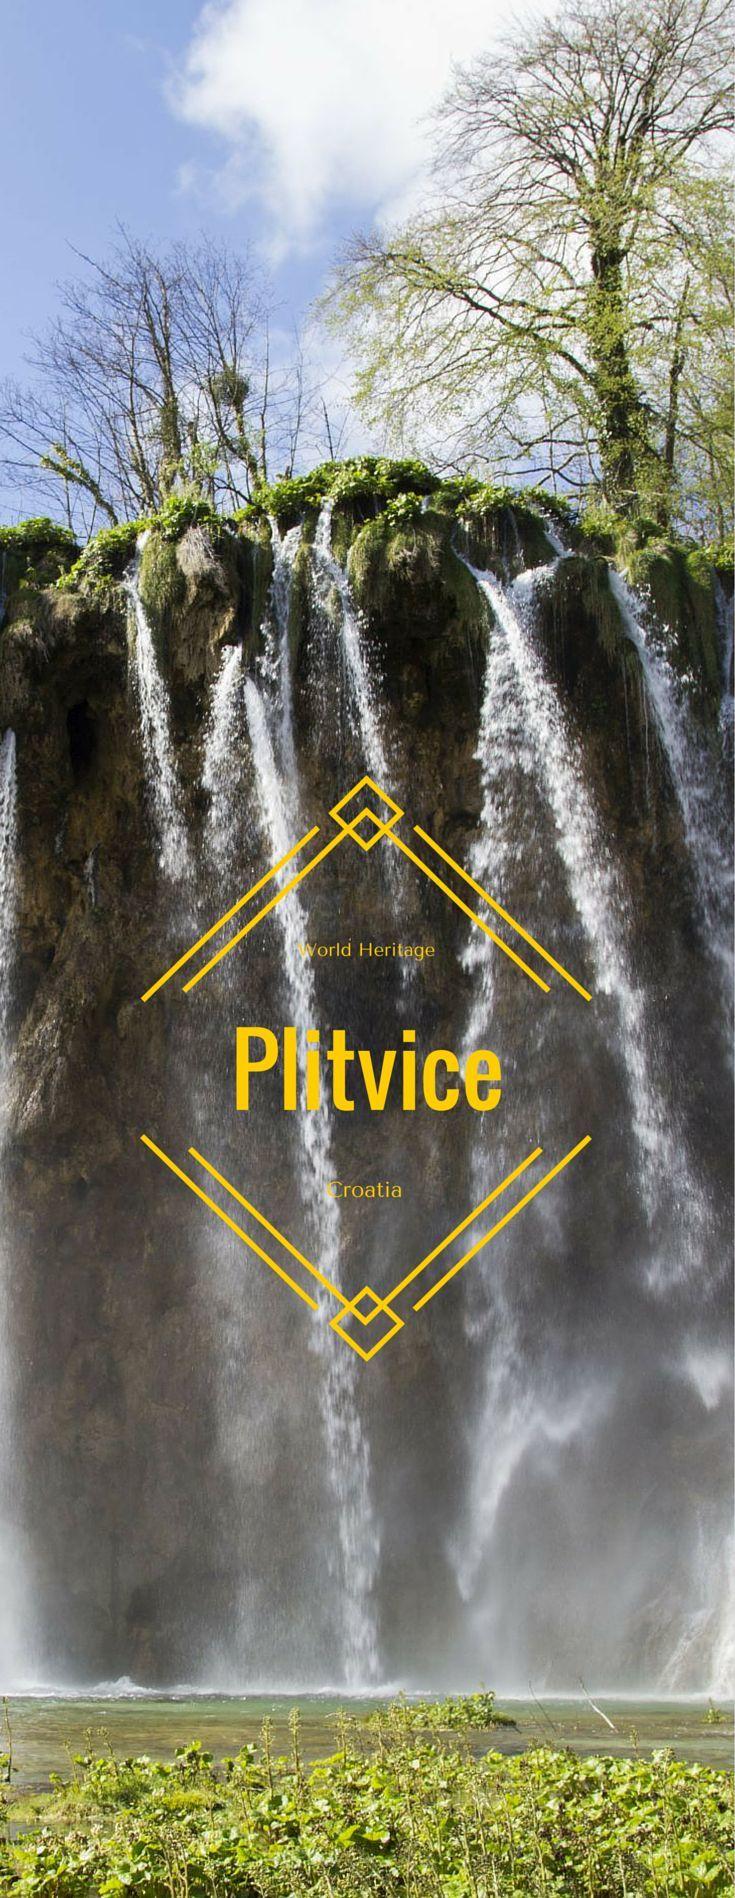 World Heritage Site - Plitvice Lakes, Croatia